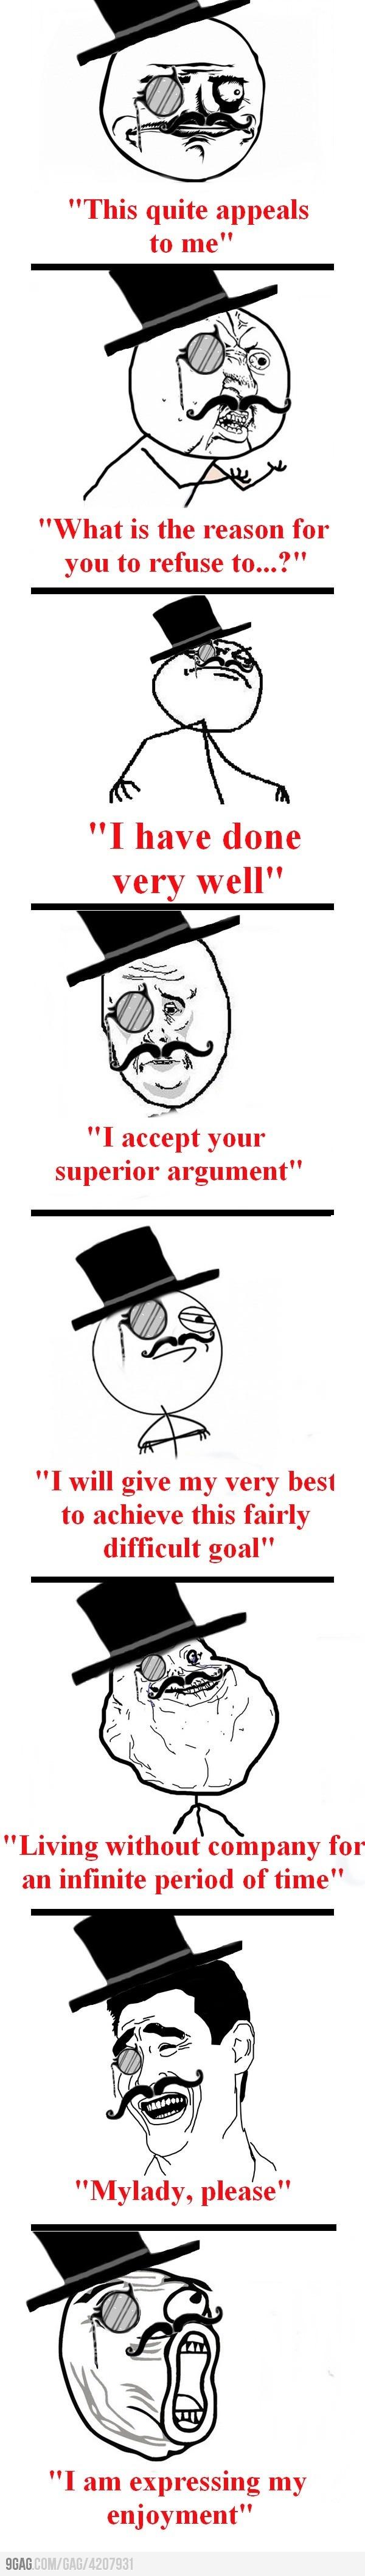 Memes like a sir..Or a lady, my good fellow..